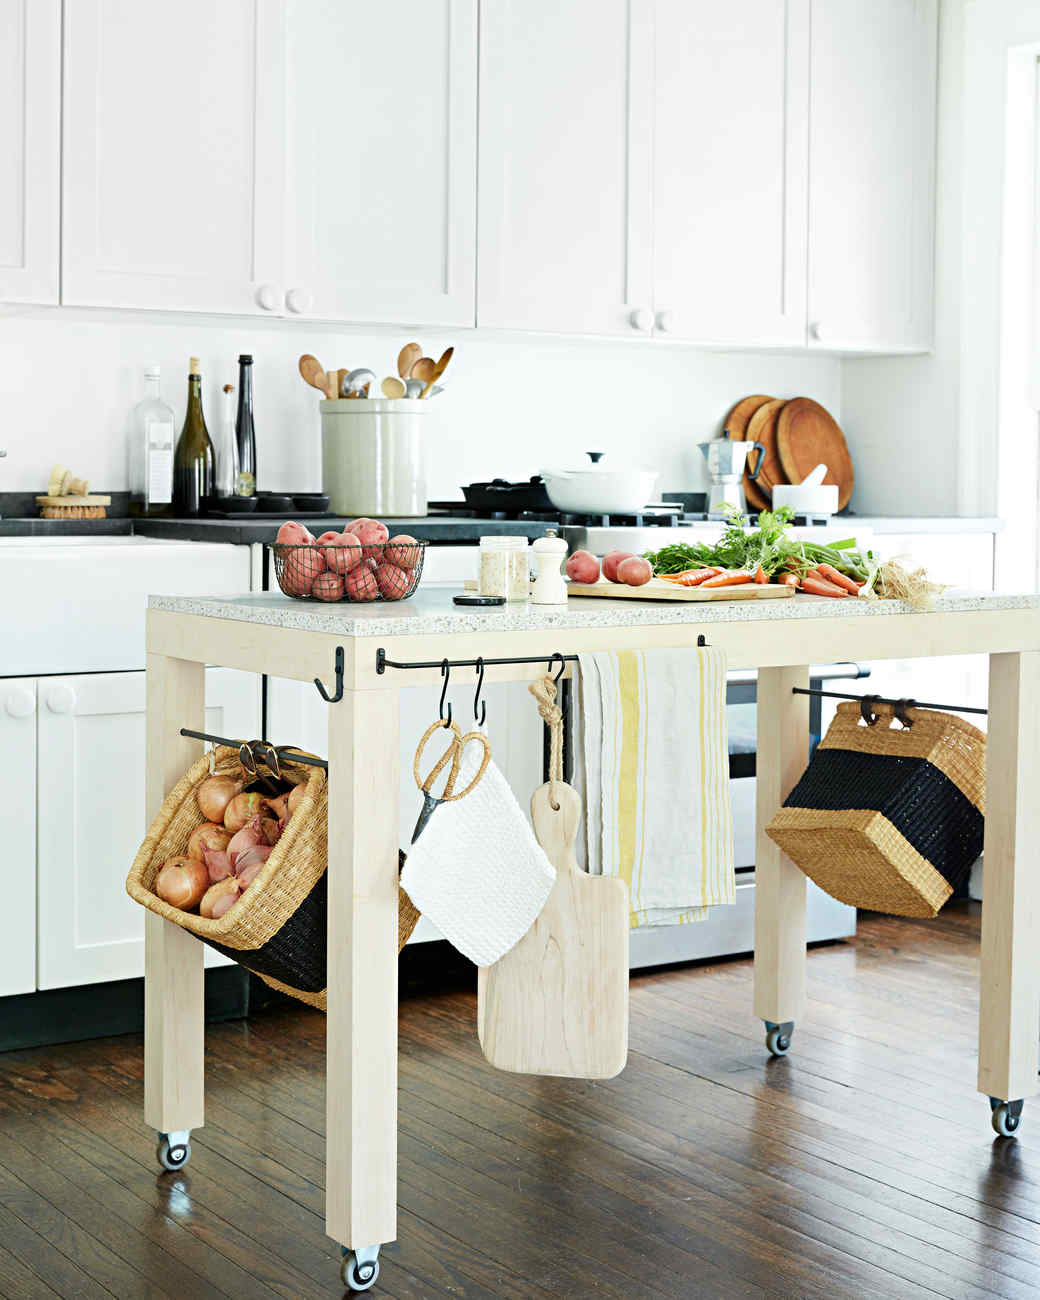 Kitchen island table with storage Build Your Own Floating Island Storage Martha Stewart The Floating Island